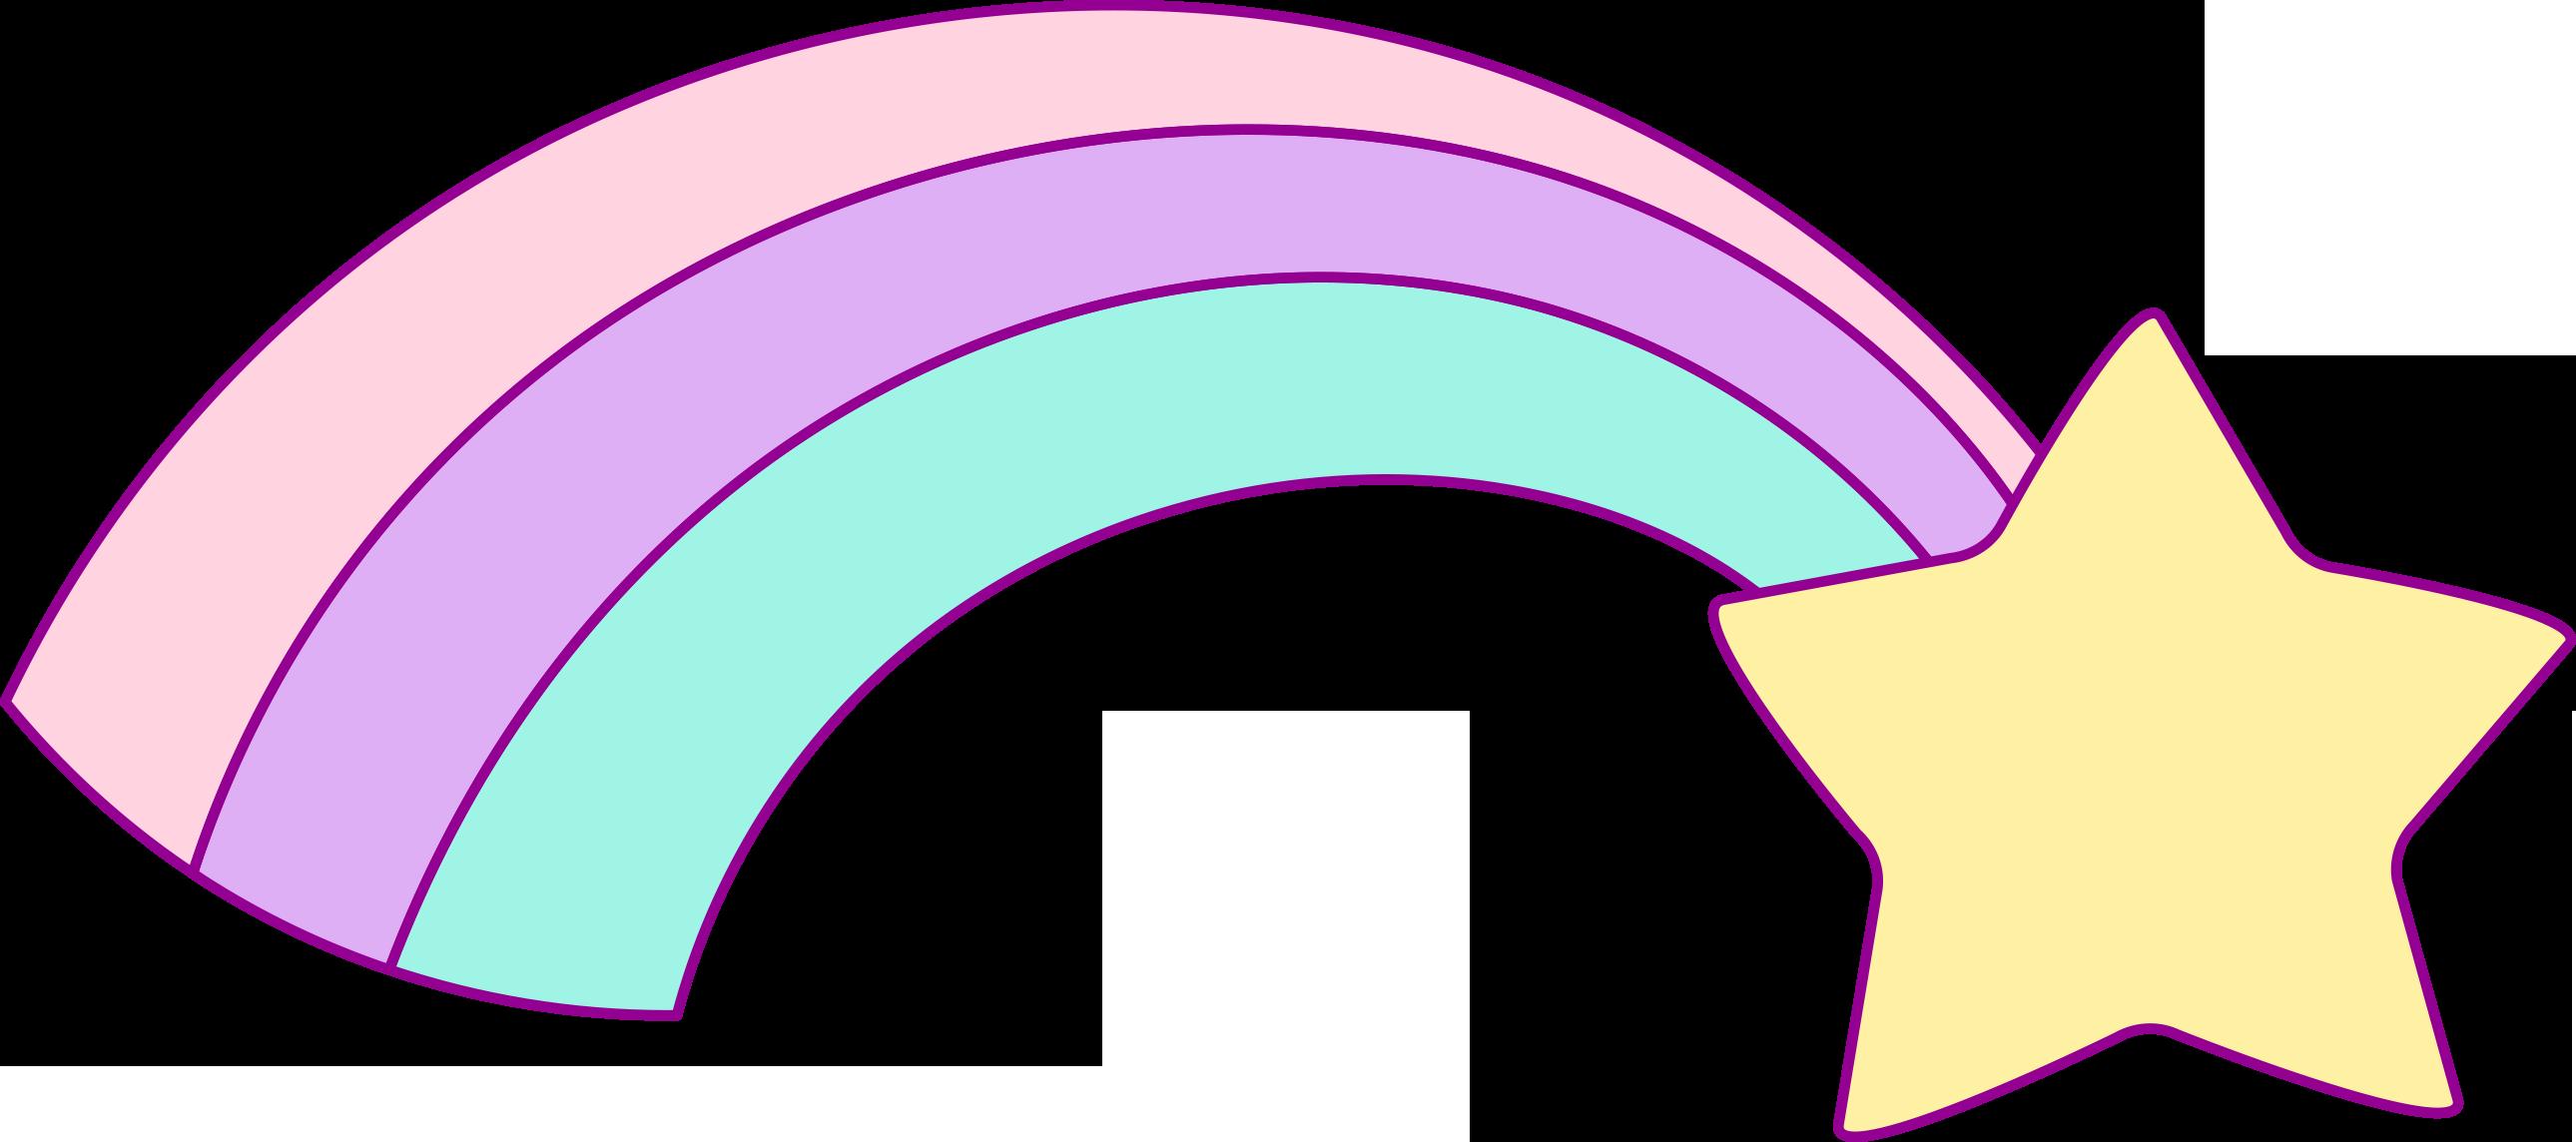 Wing clipart unicorn. Free hand drawn clip